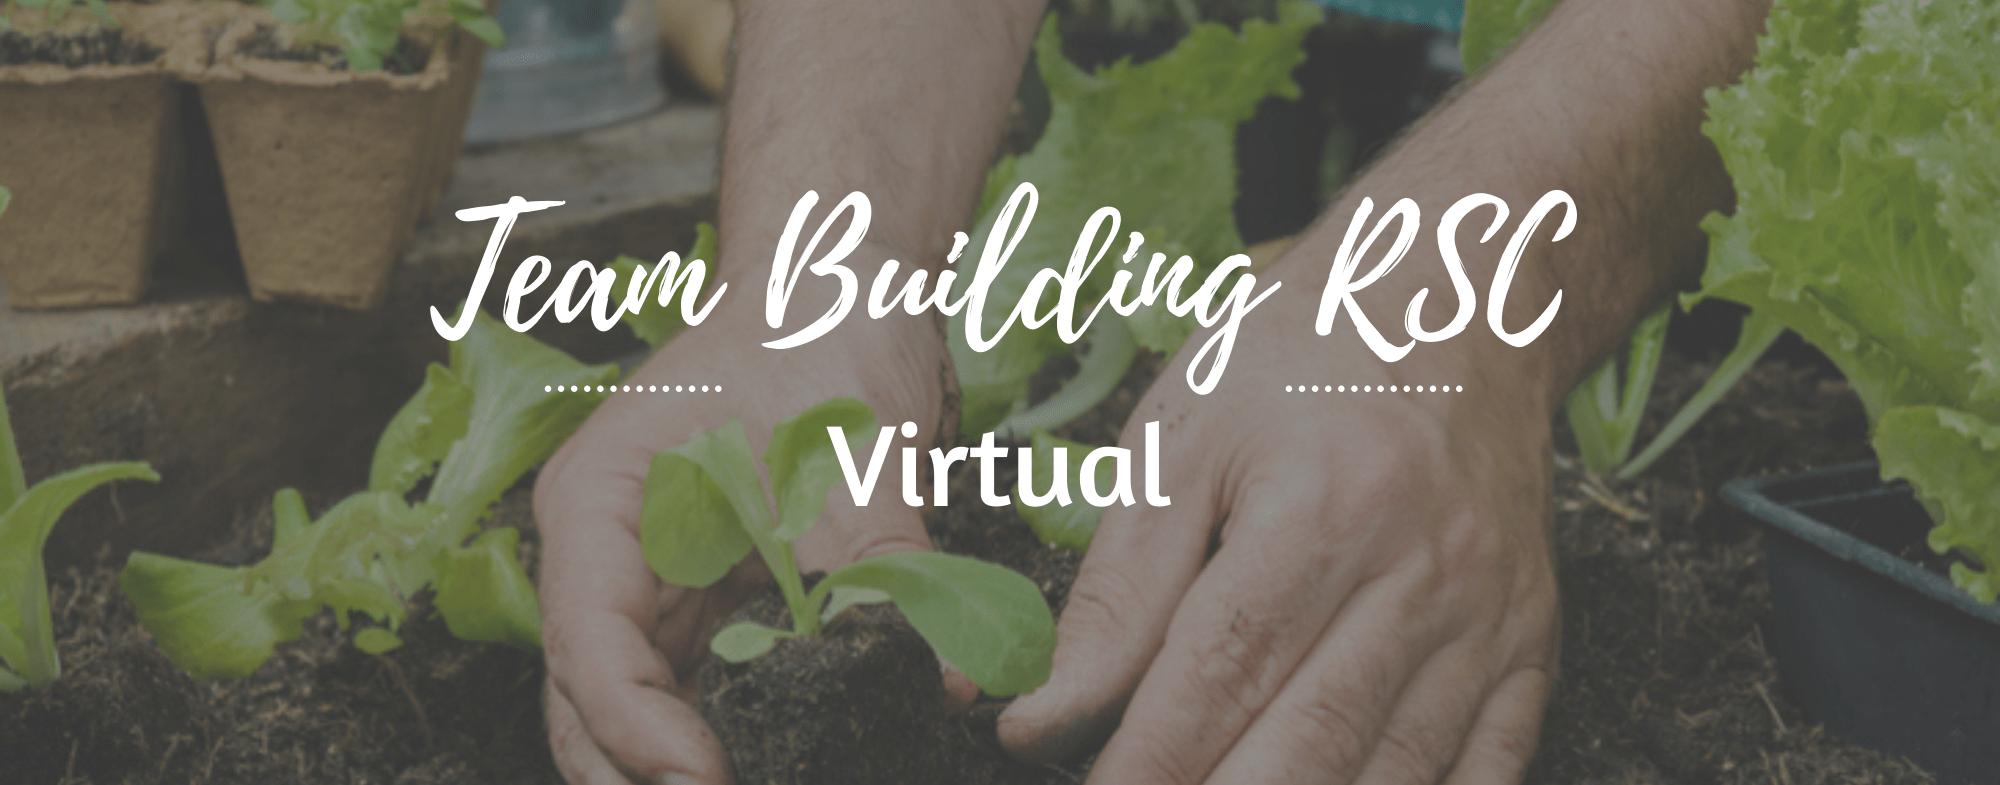 Team Building RSC Virtual